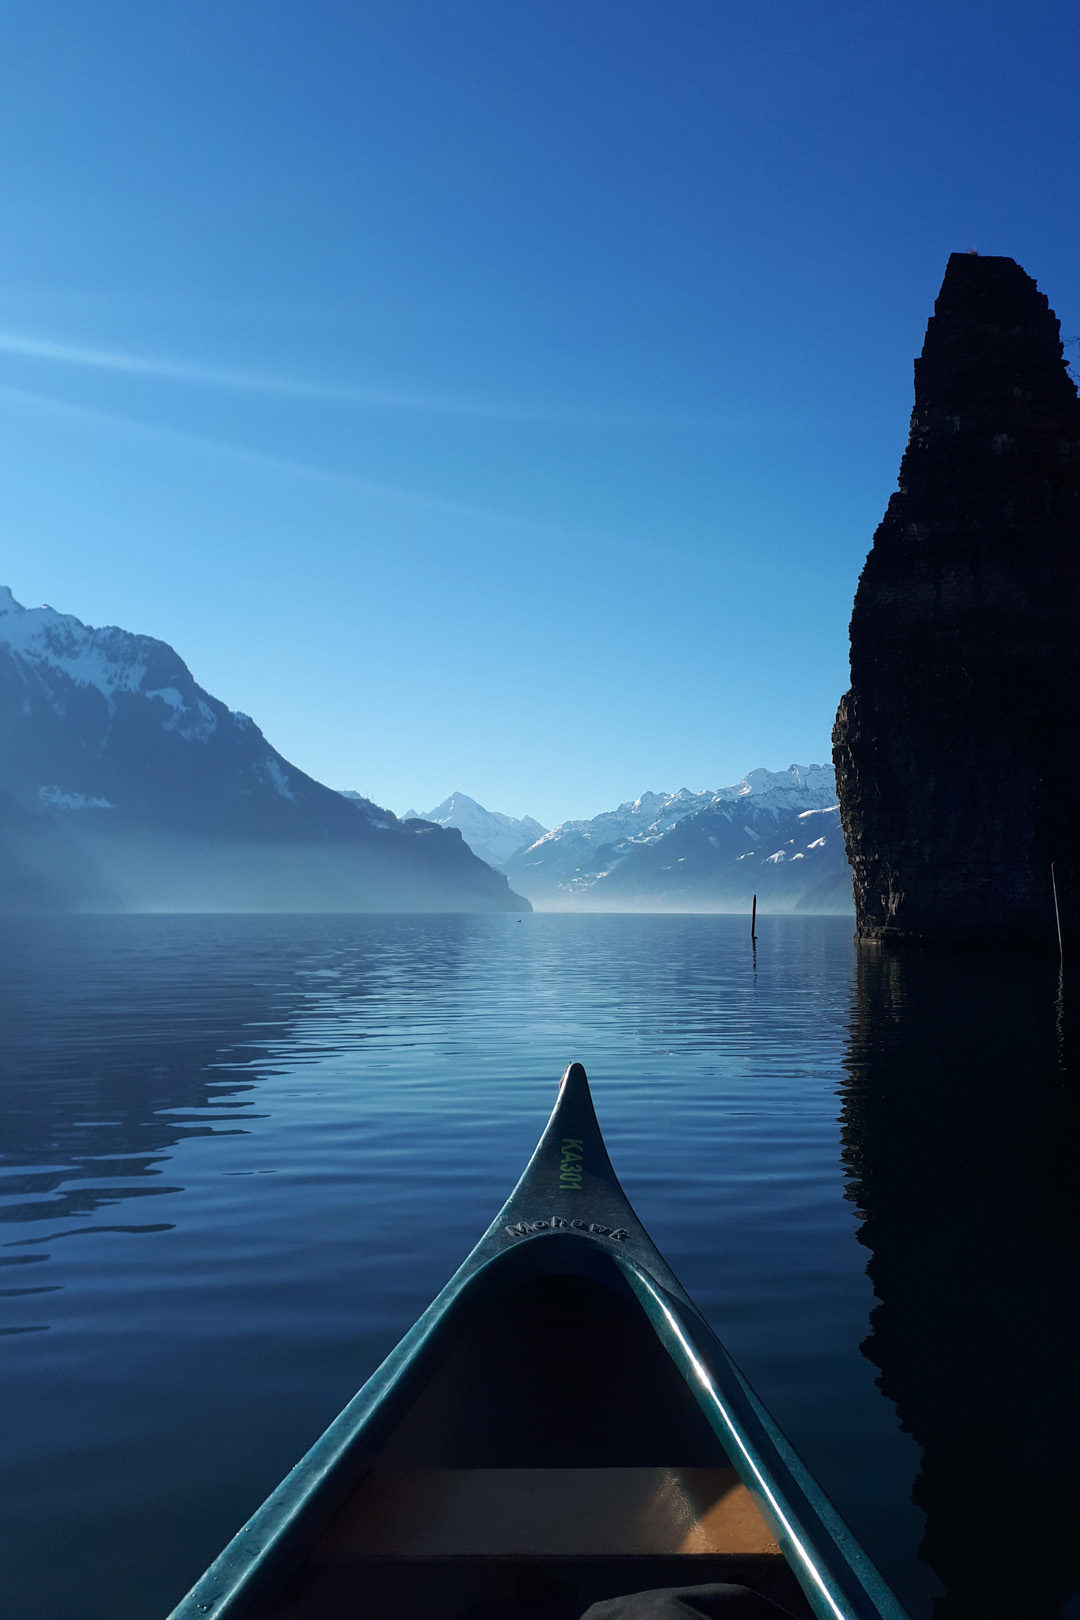 Canoe winter tours on Lake Lucerne